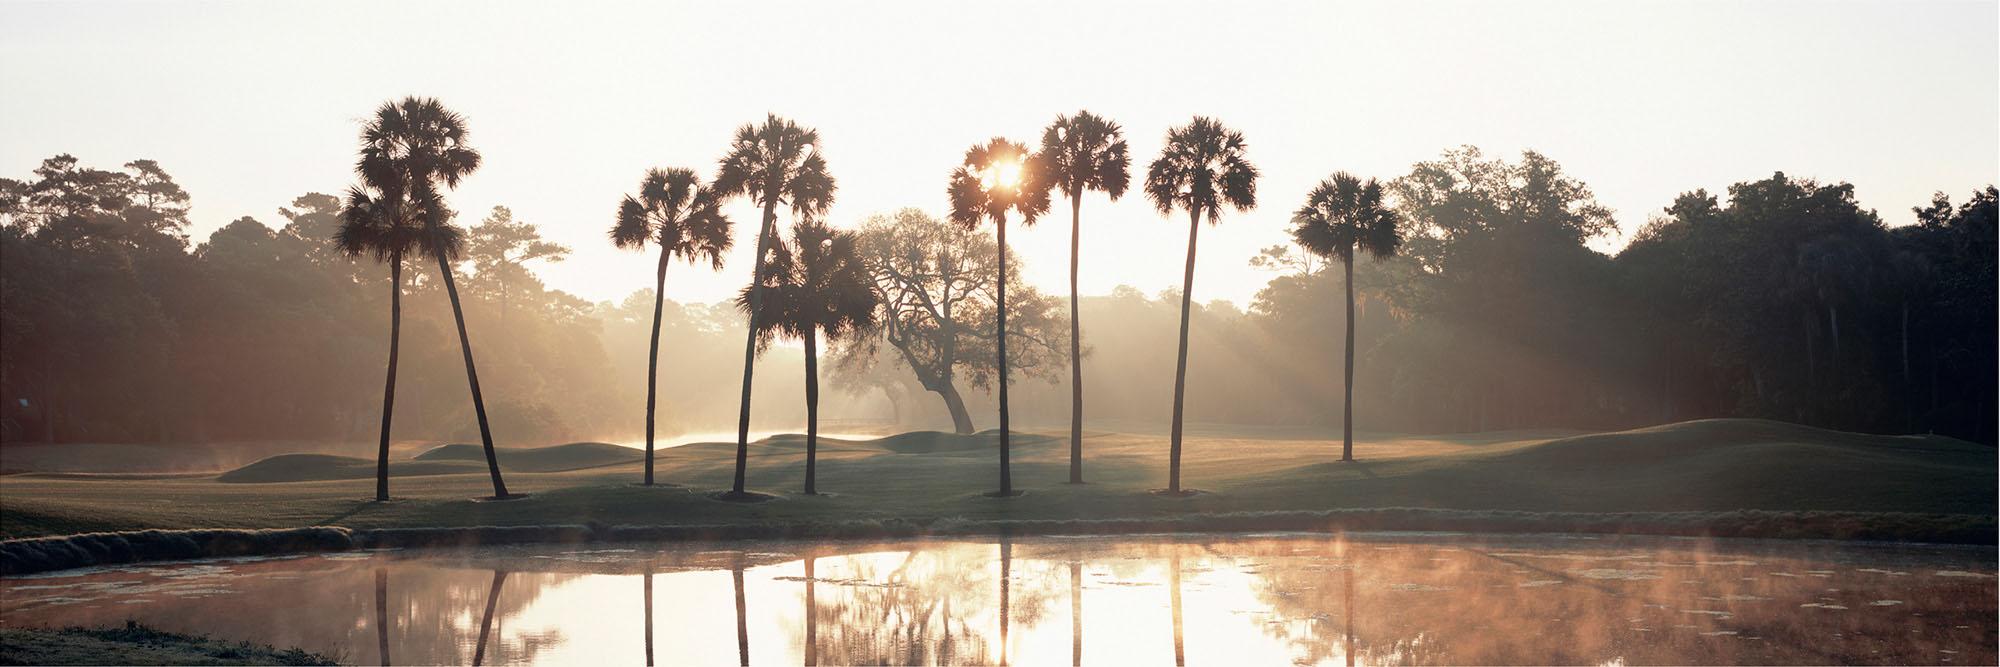 Golf Course Image - Kiawah Cougar Point No. 17